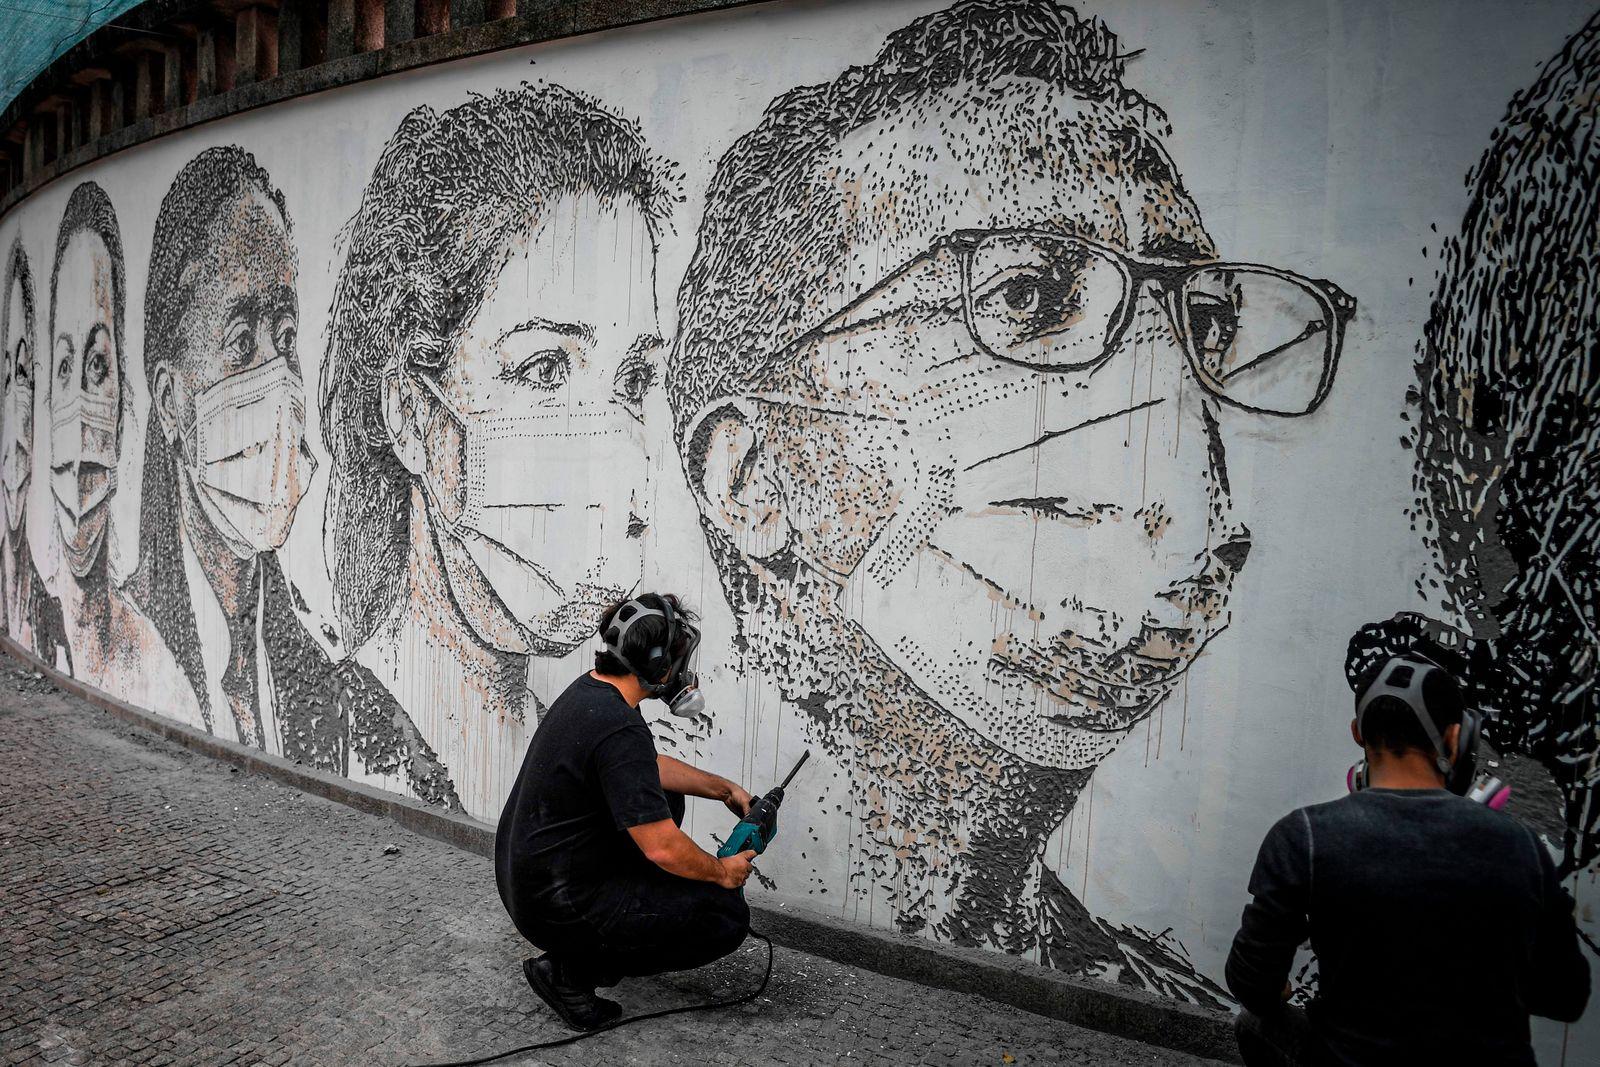 PORTUGAL-ART-VIRUS-HEALTH